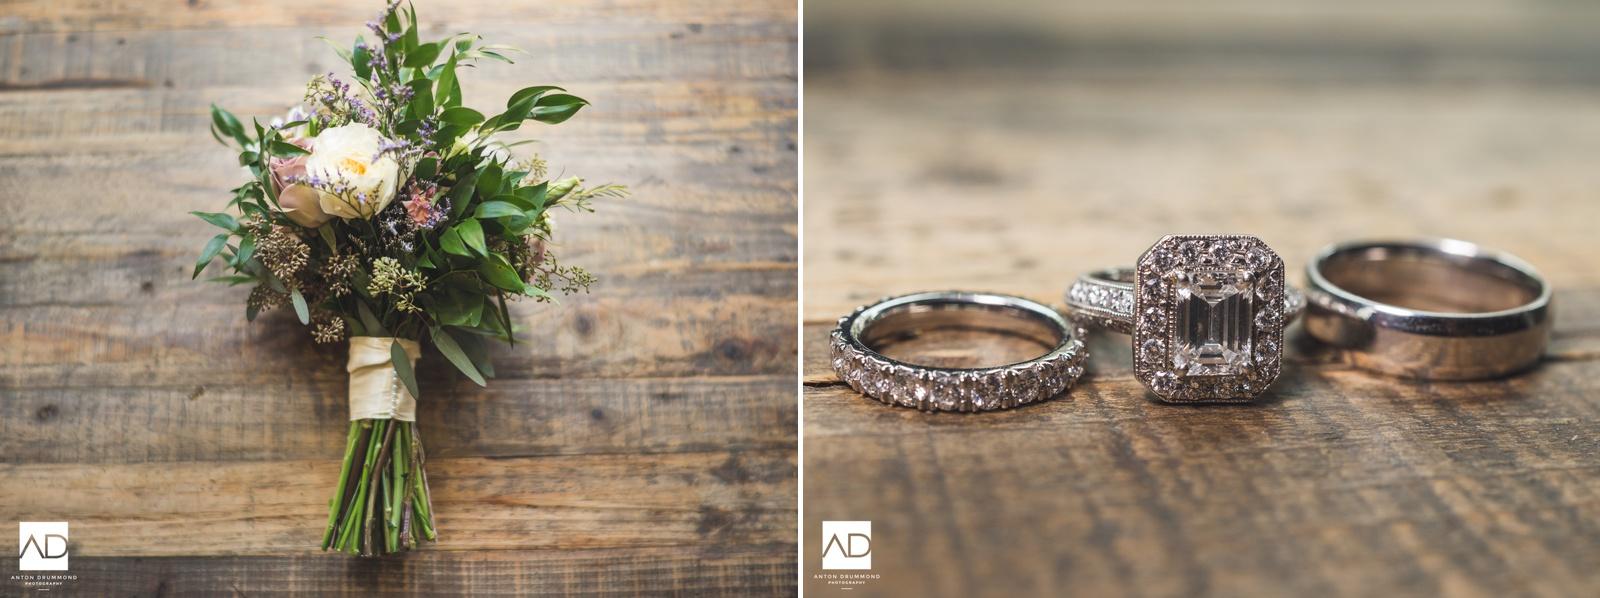 Flowers + Ring.jpg